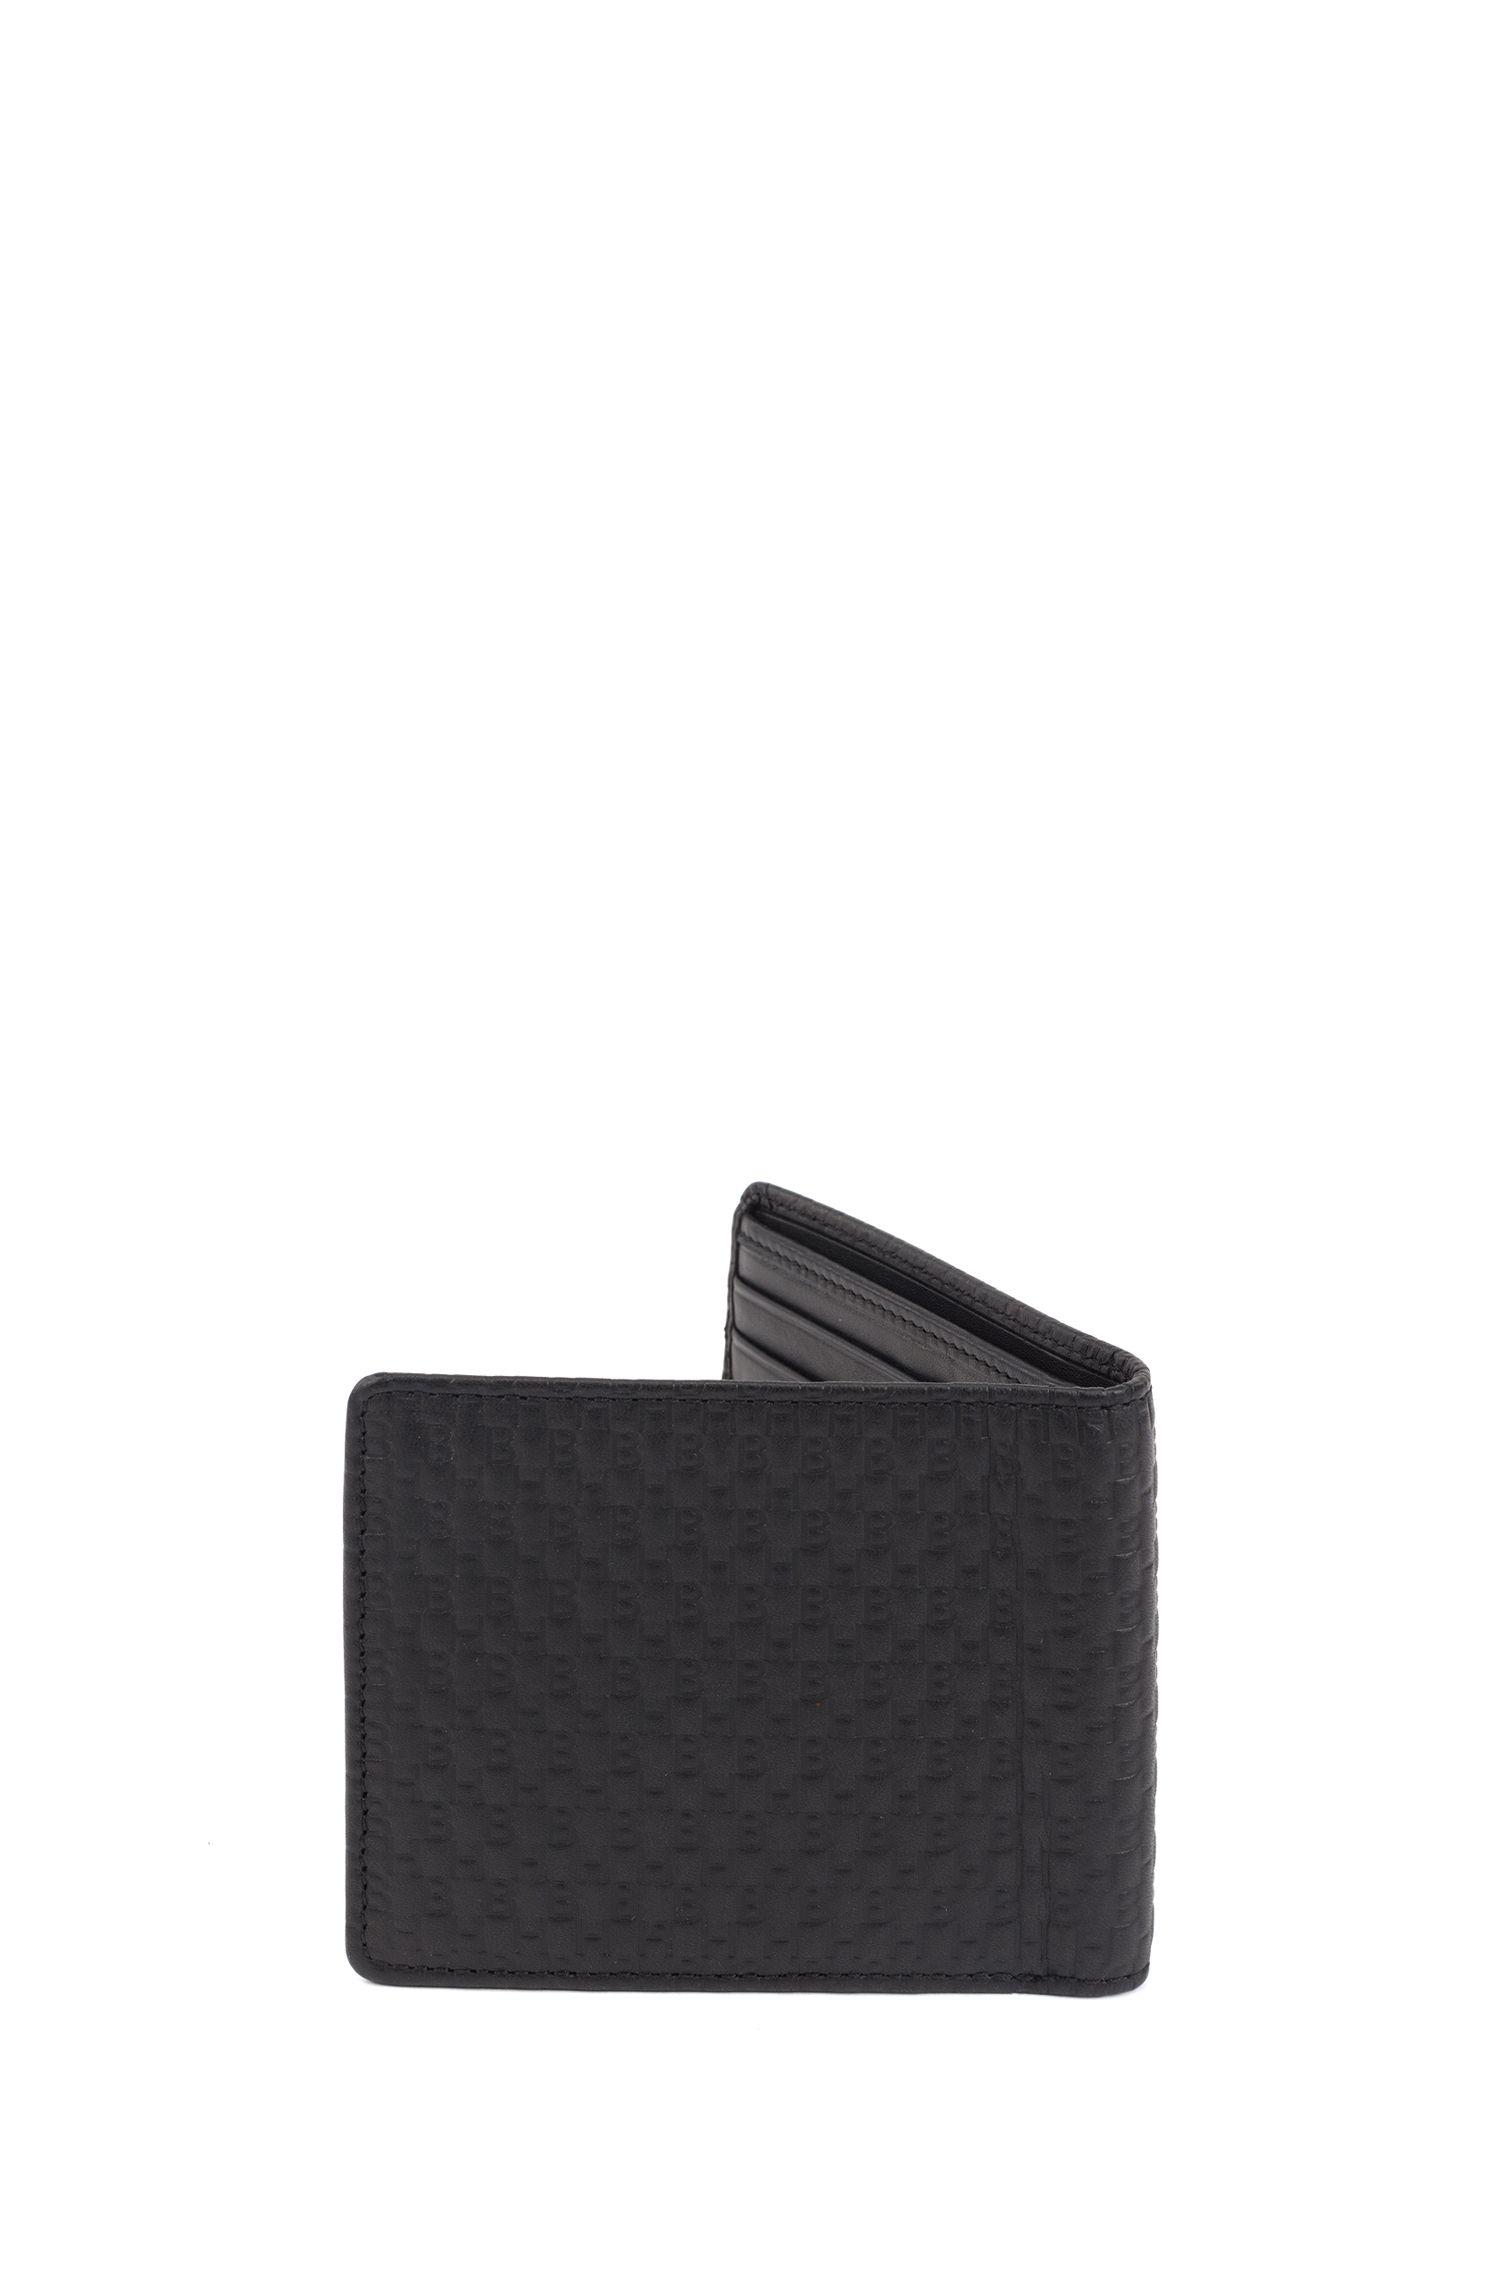 Billfold wallet in monogram-printed Italian leather, Black